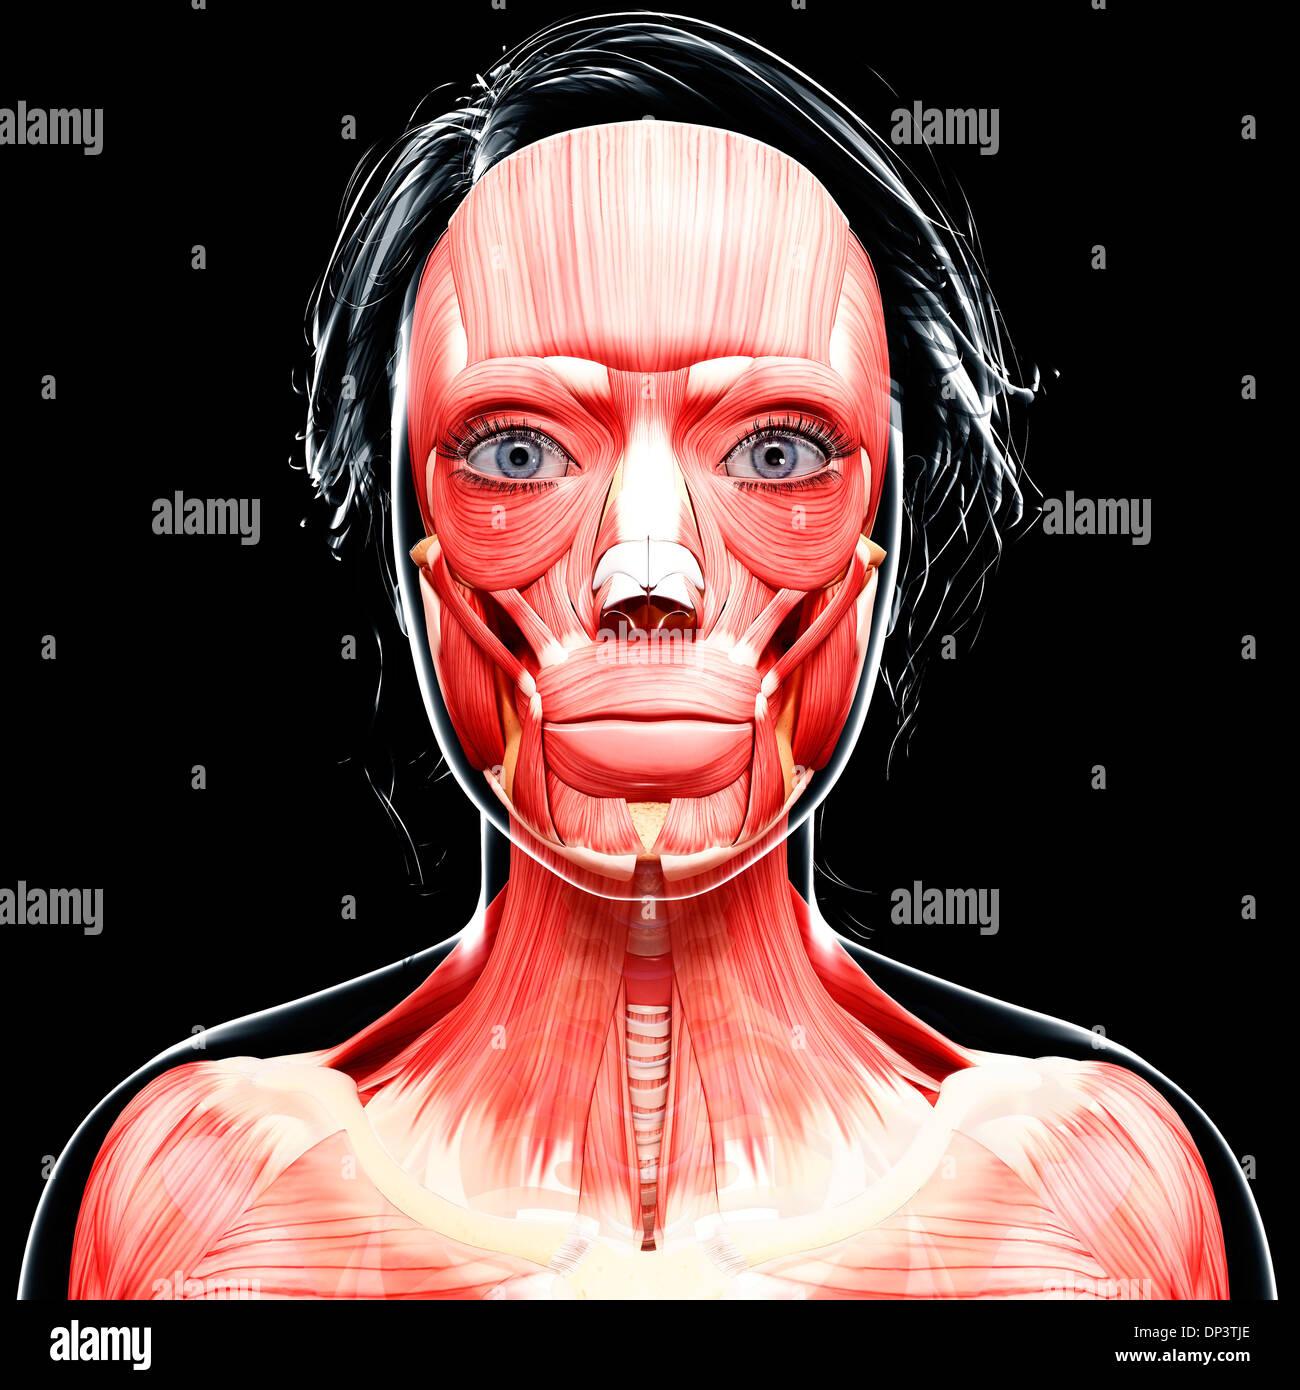 Female head musculature, artwork Stock Photo